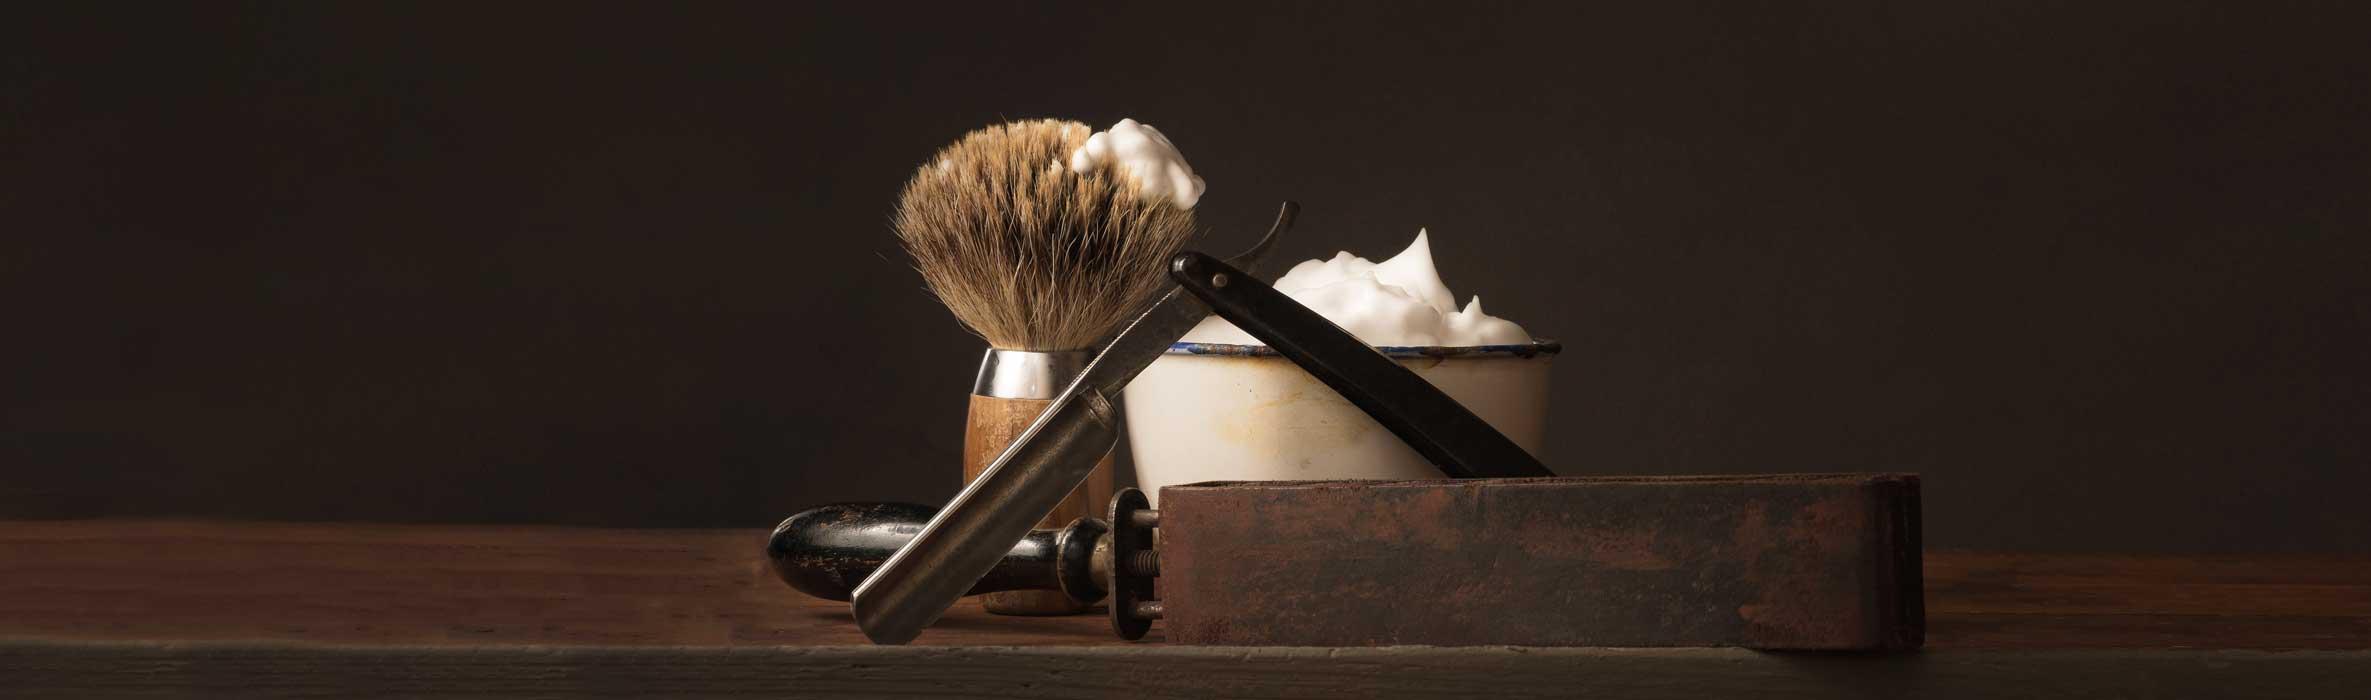 Cut Throat Razor With Shaving Cream And Shaving Brush